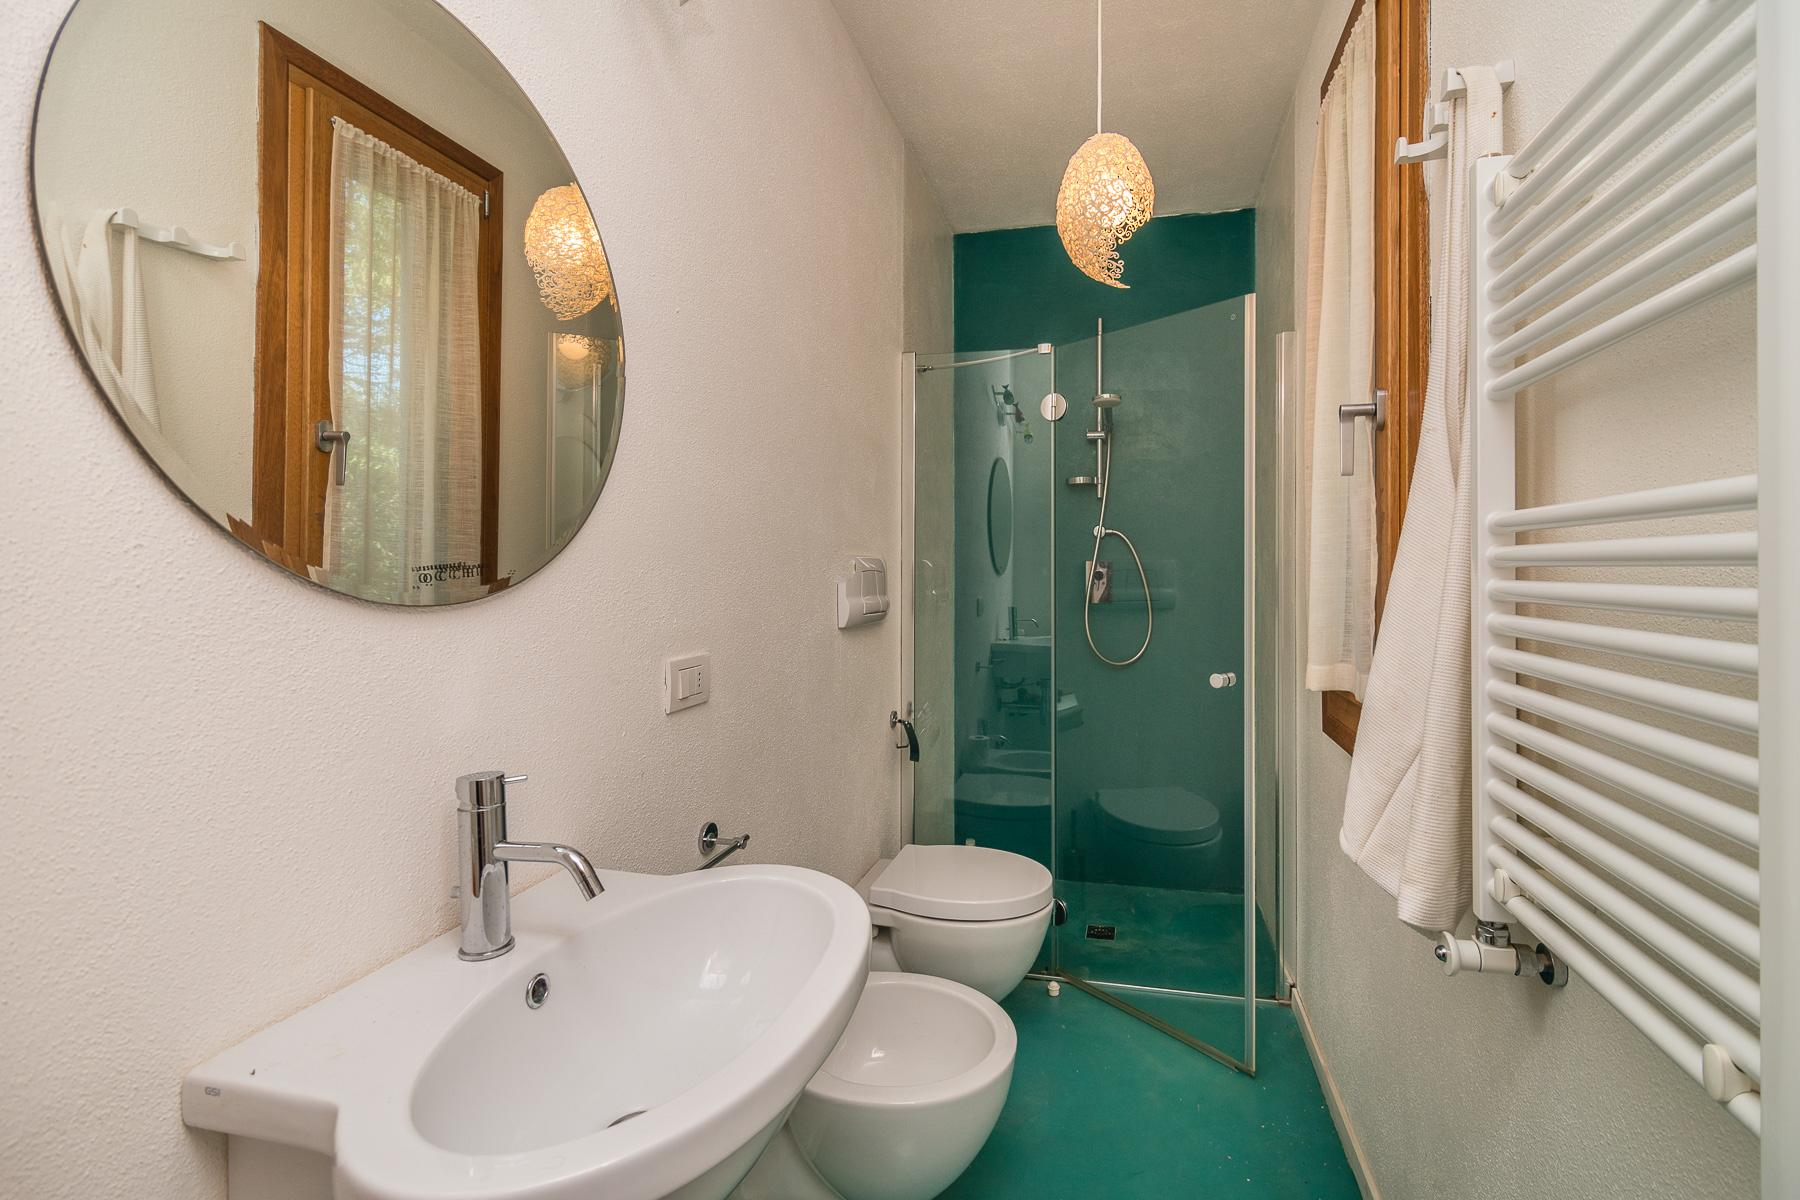 Golfo Aranci Sos Aranzos Wonderfull Villa with direct access to the beach - 13